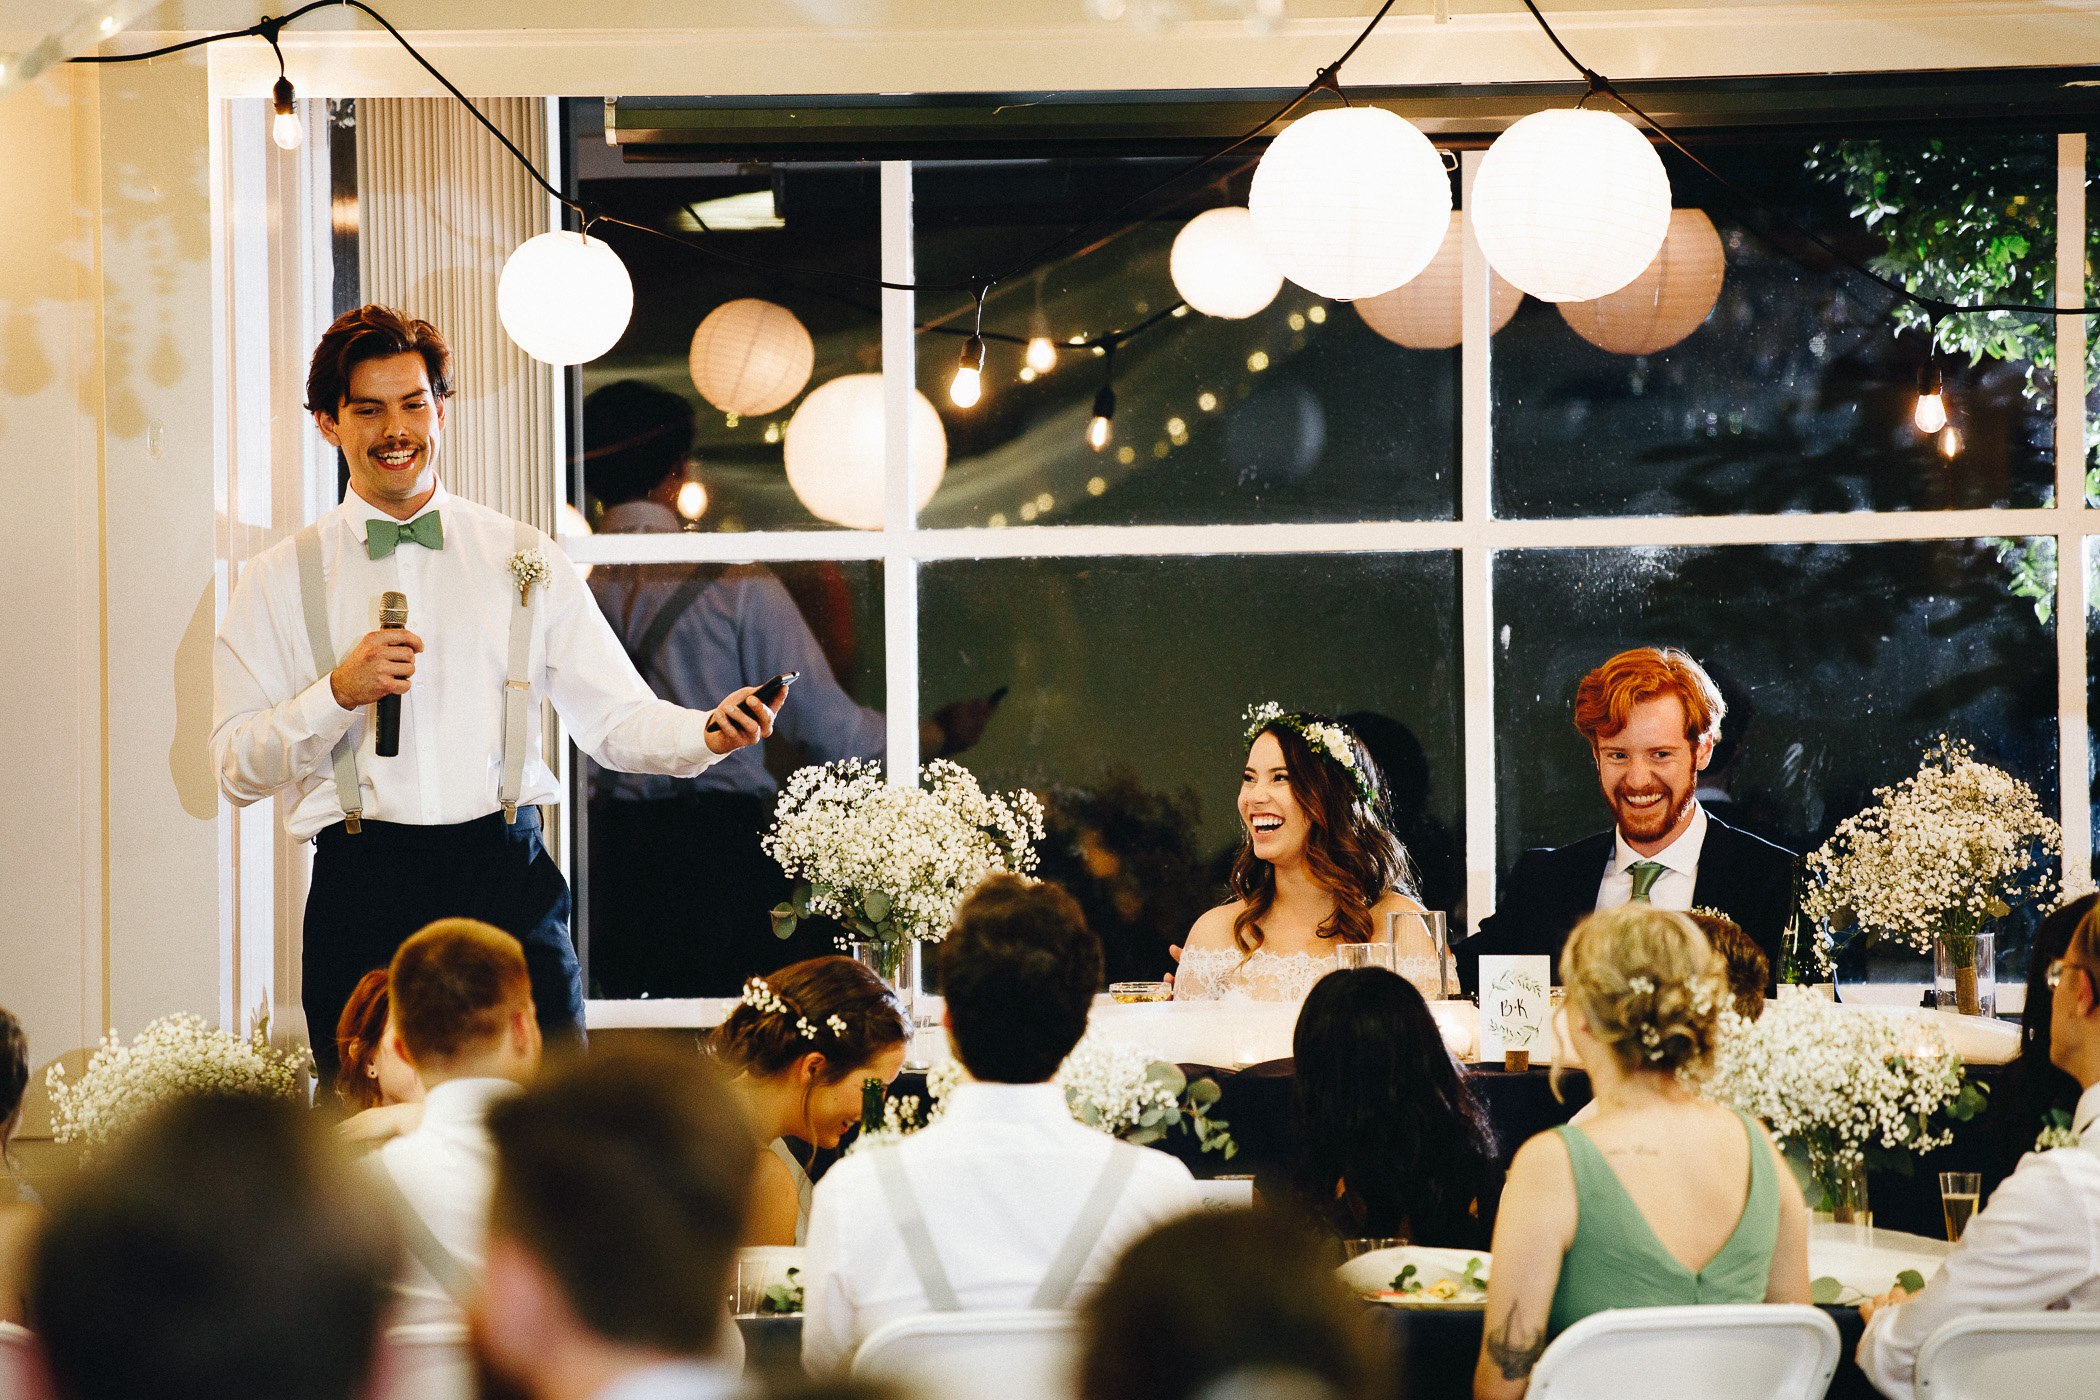 181104-Luxium-Weddings-Arizona-@matt__Le-Brandon-Kariana-Phoenix-Valley-Garden-Center-1129.jpg